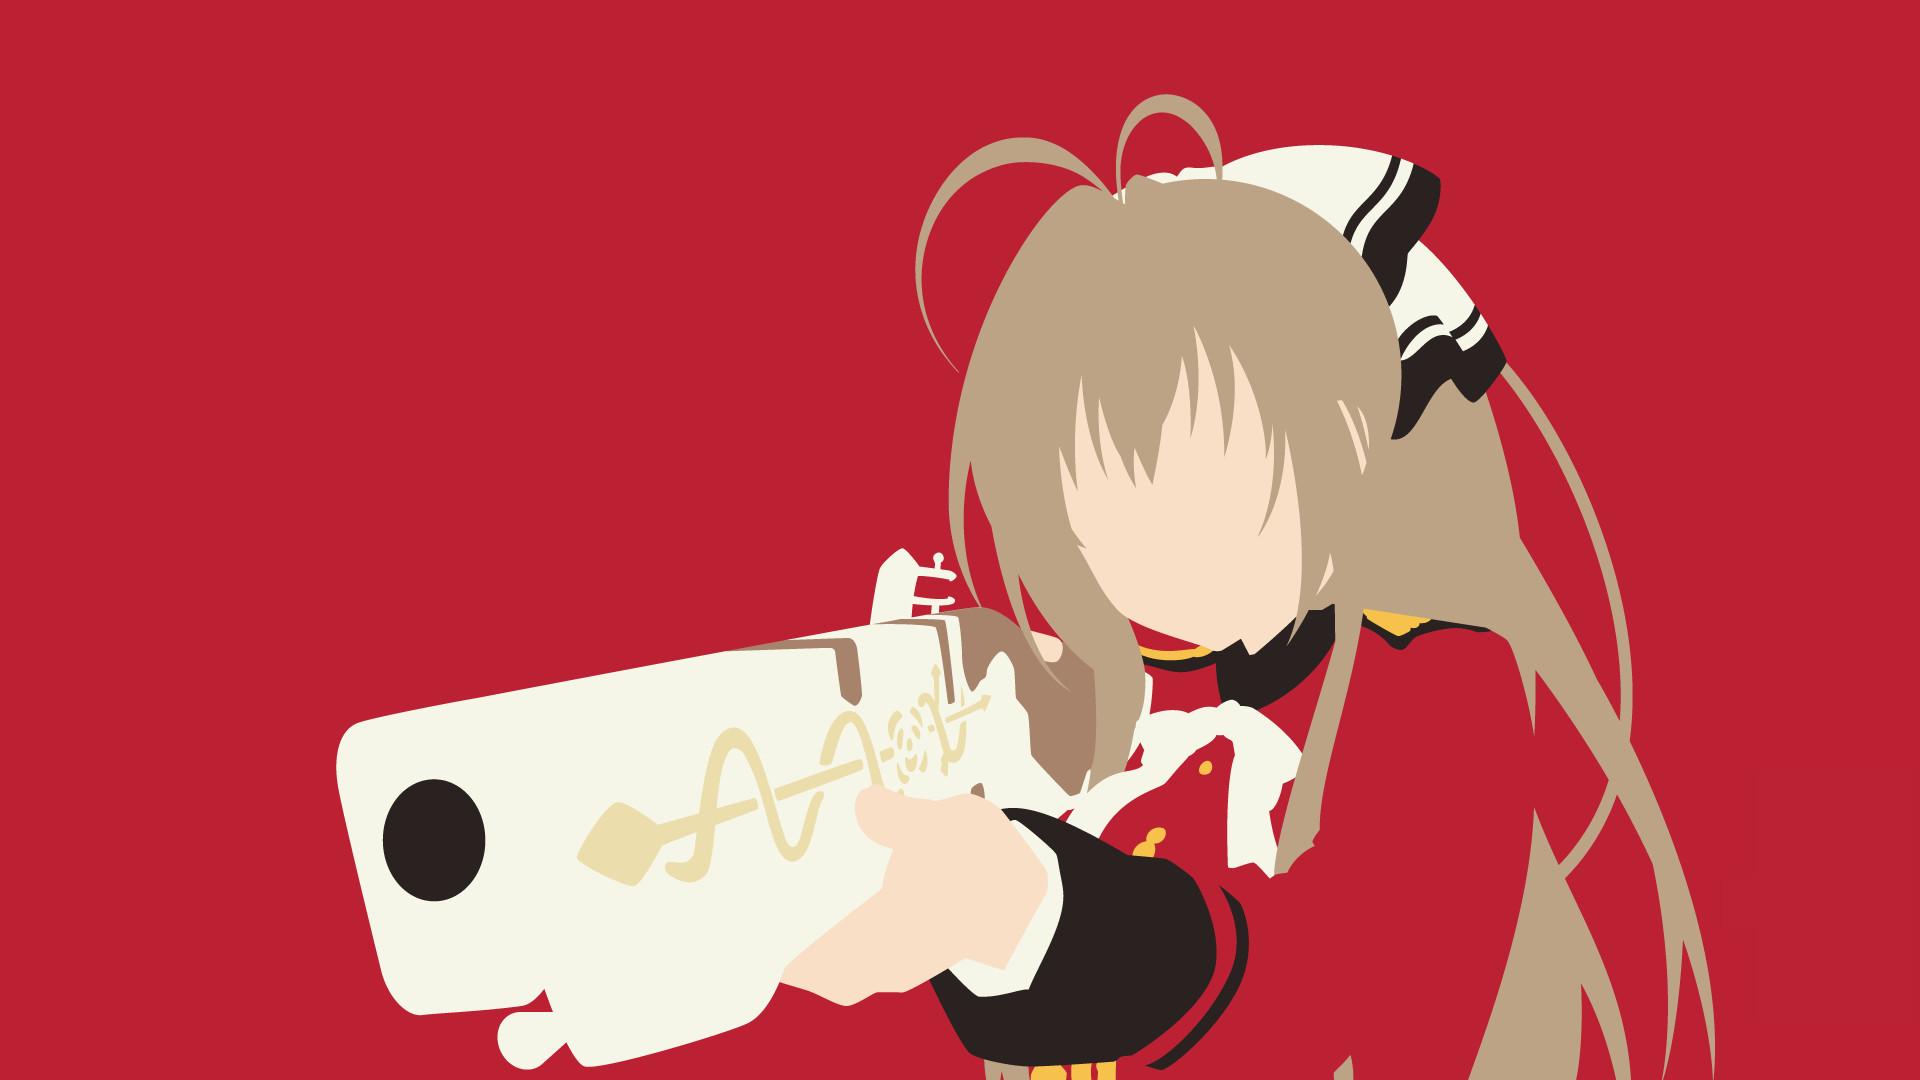 Anime wallpapers part 3 minimalist edition